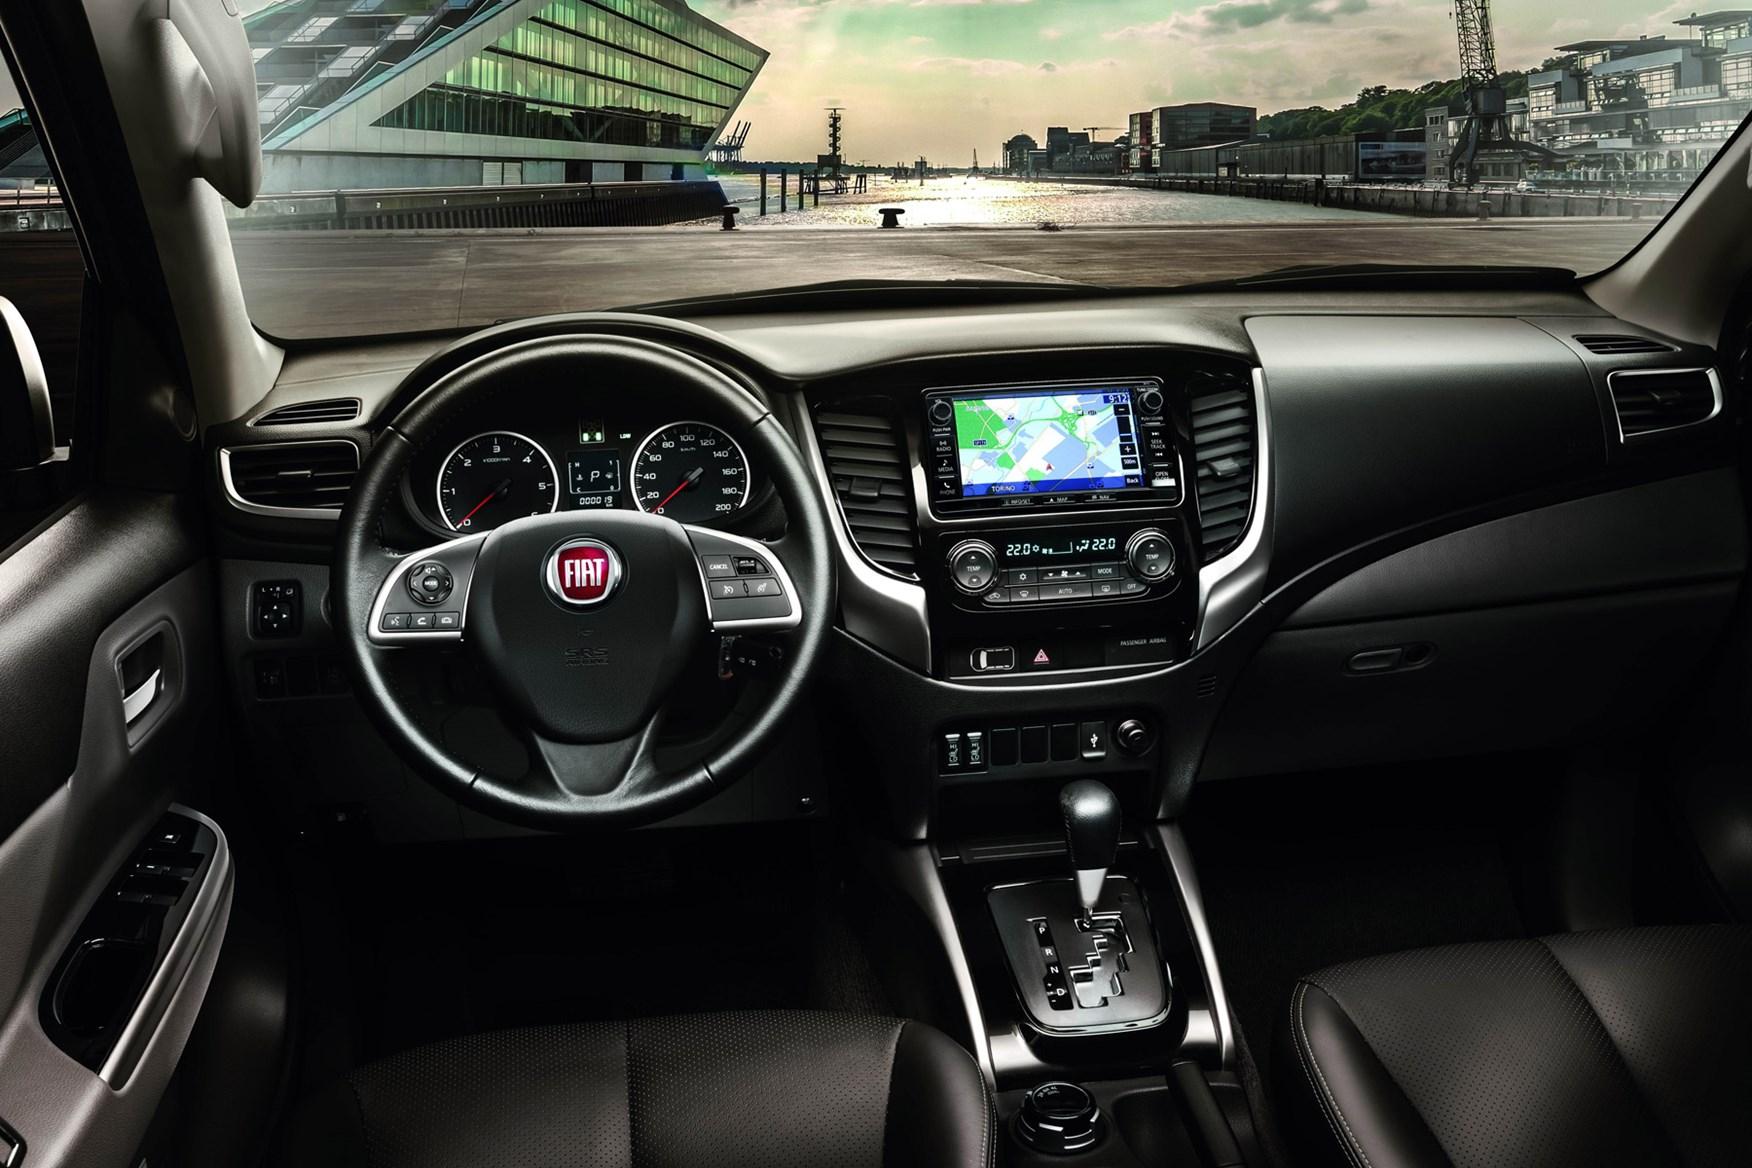 Fiat Fullback full review on Parkers Vans - interior